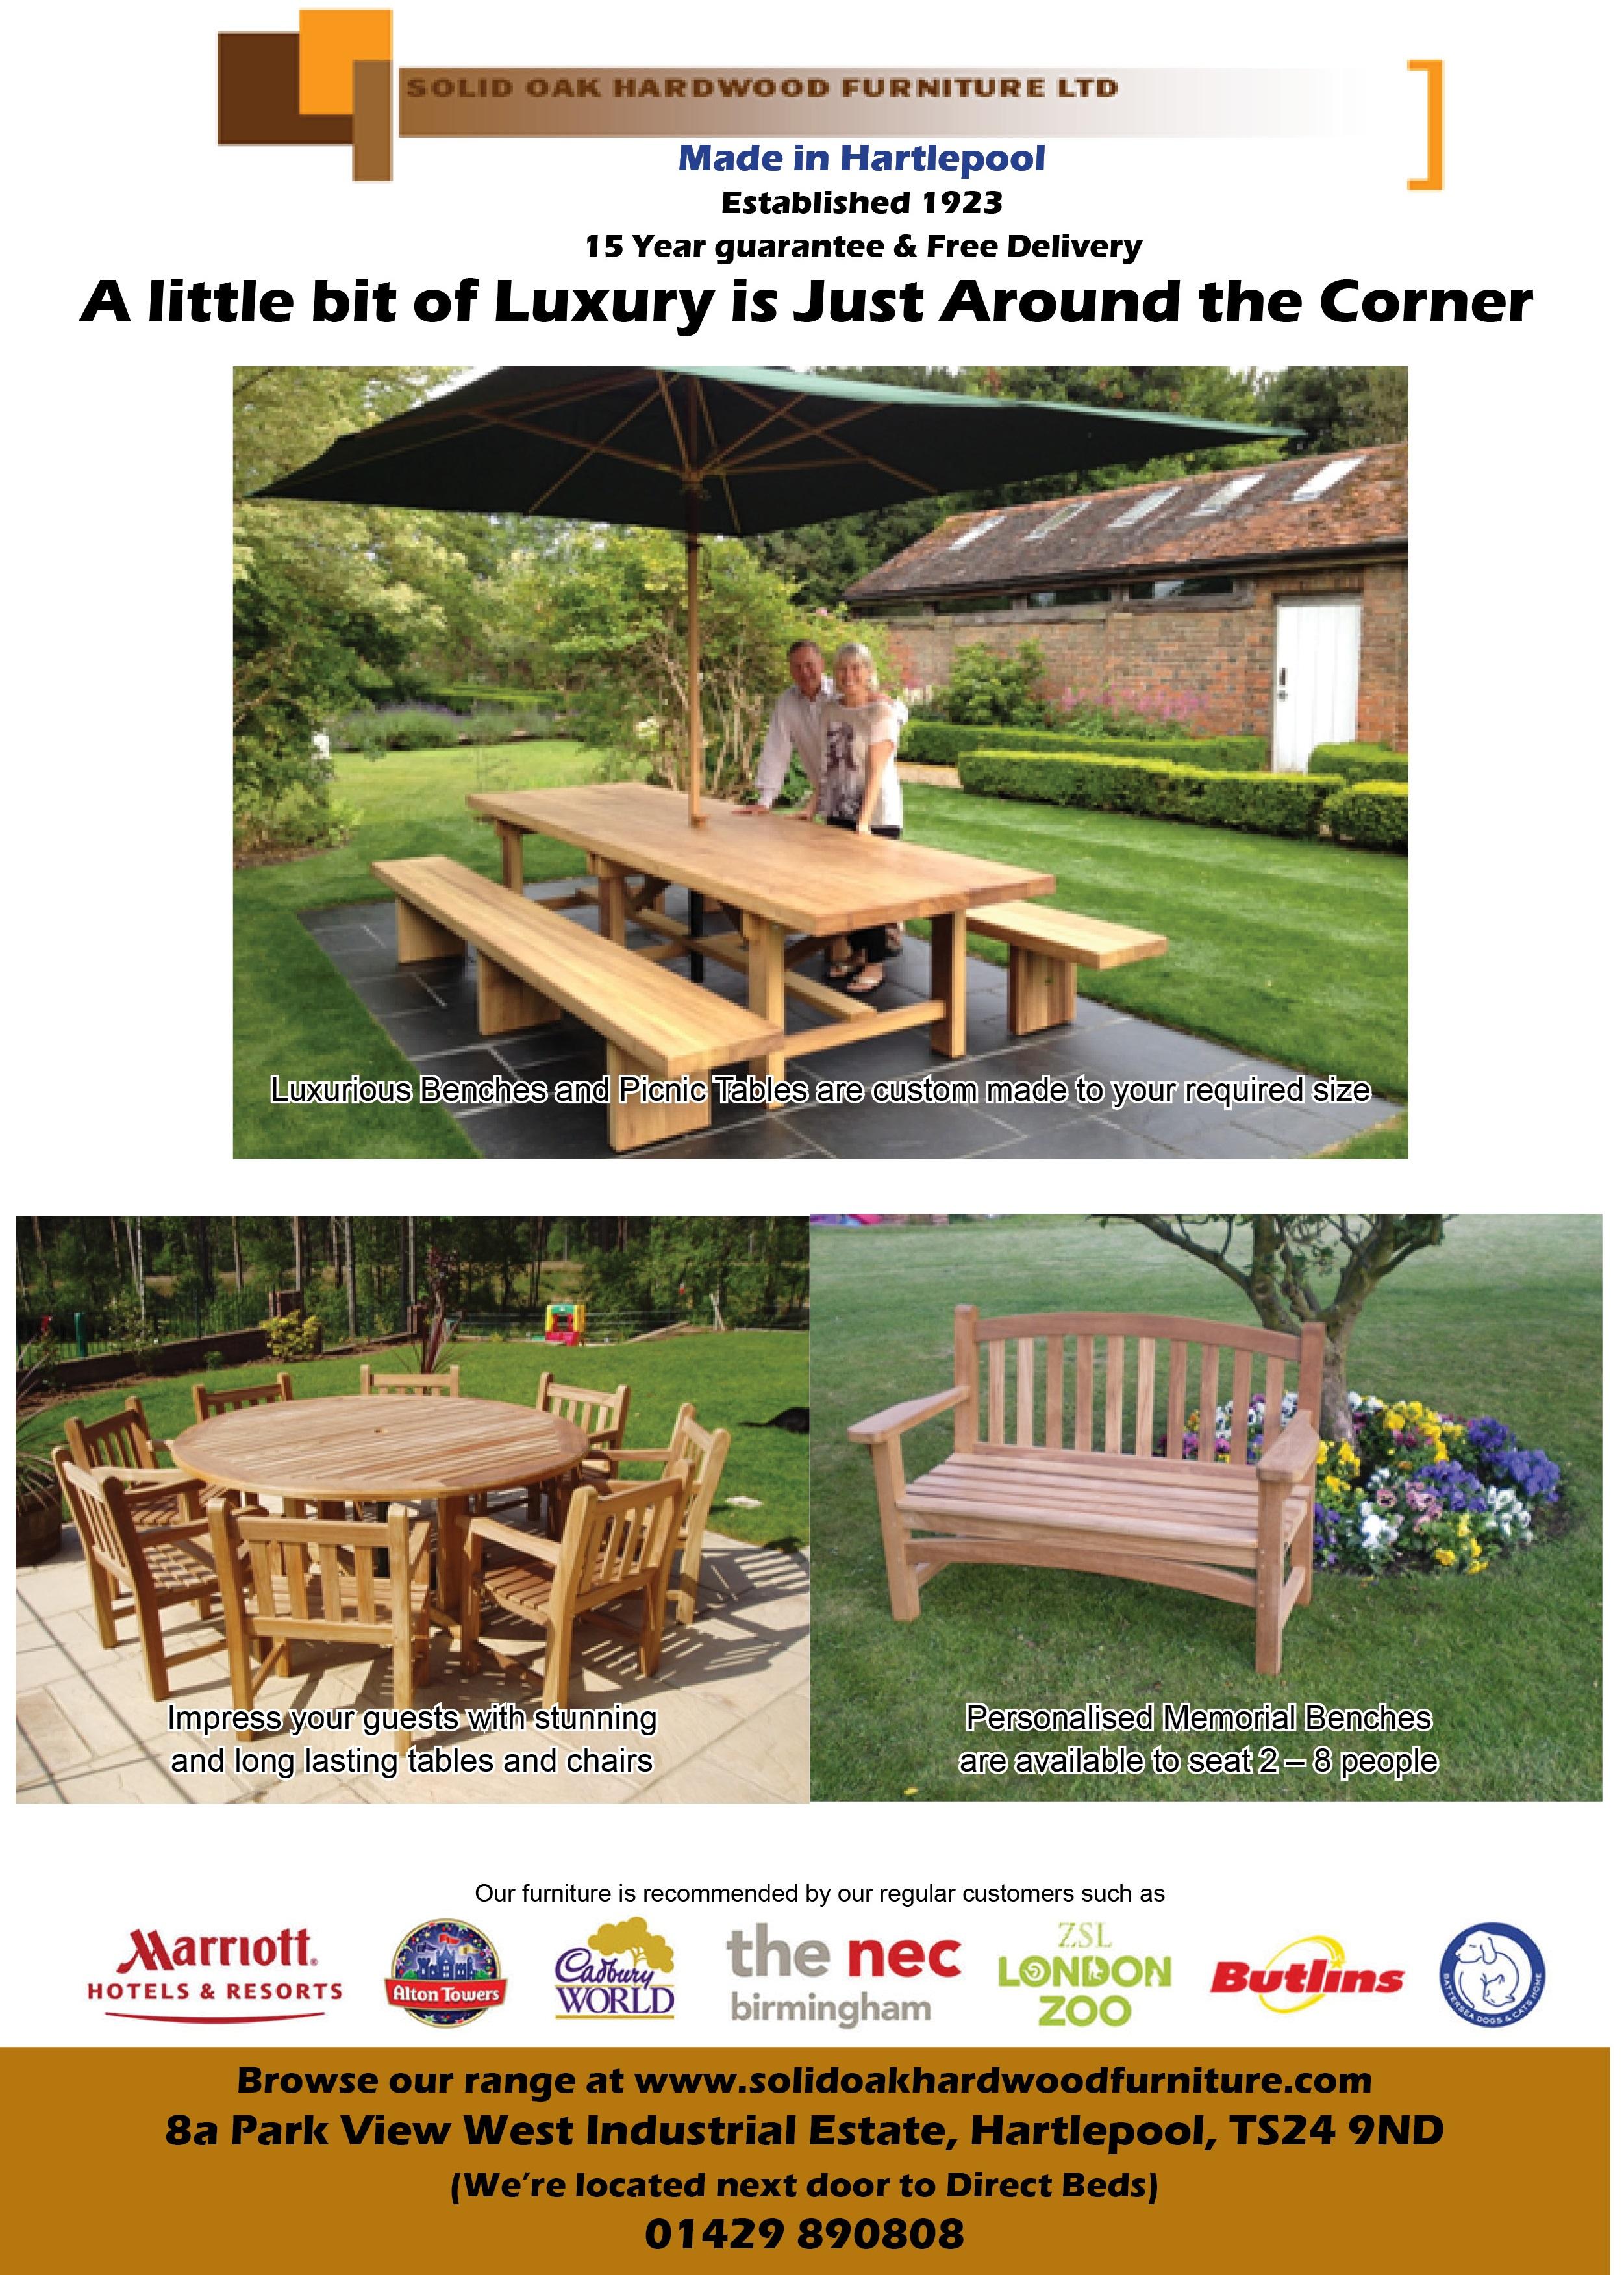 Solid Oak Hardwood Furniture Ltd